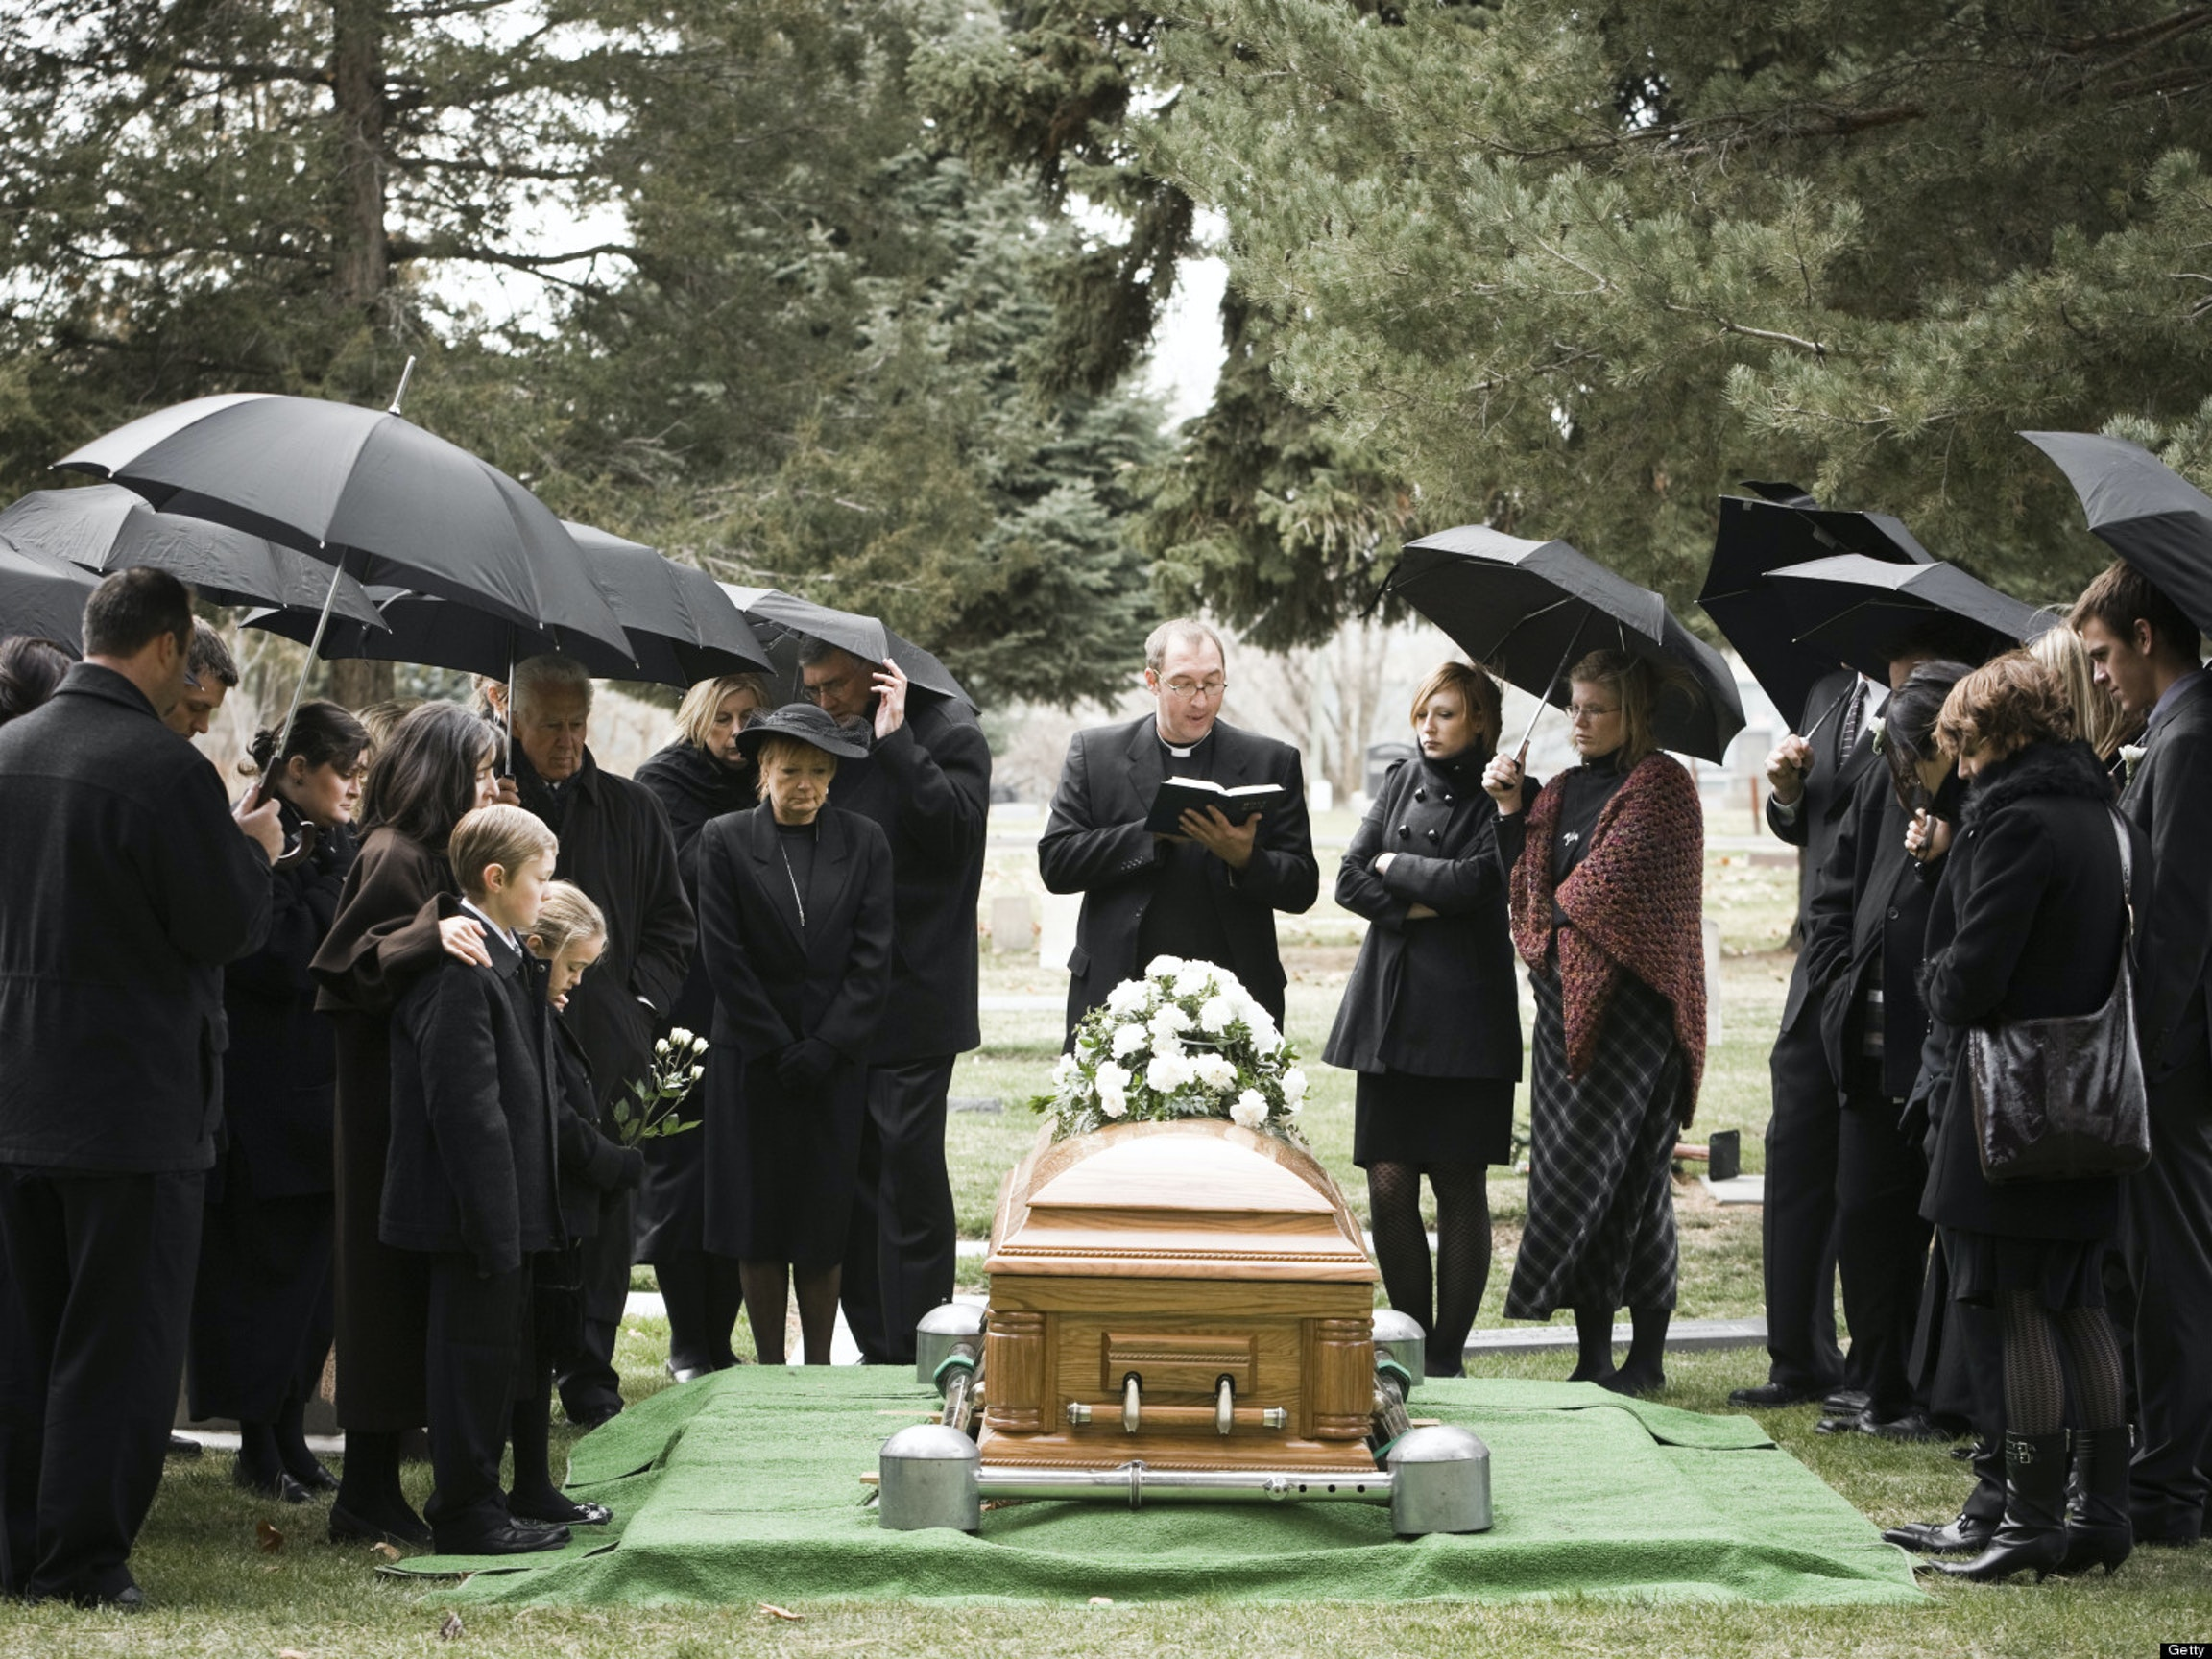 Why We Wear Black When We Mourn